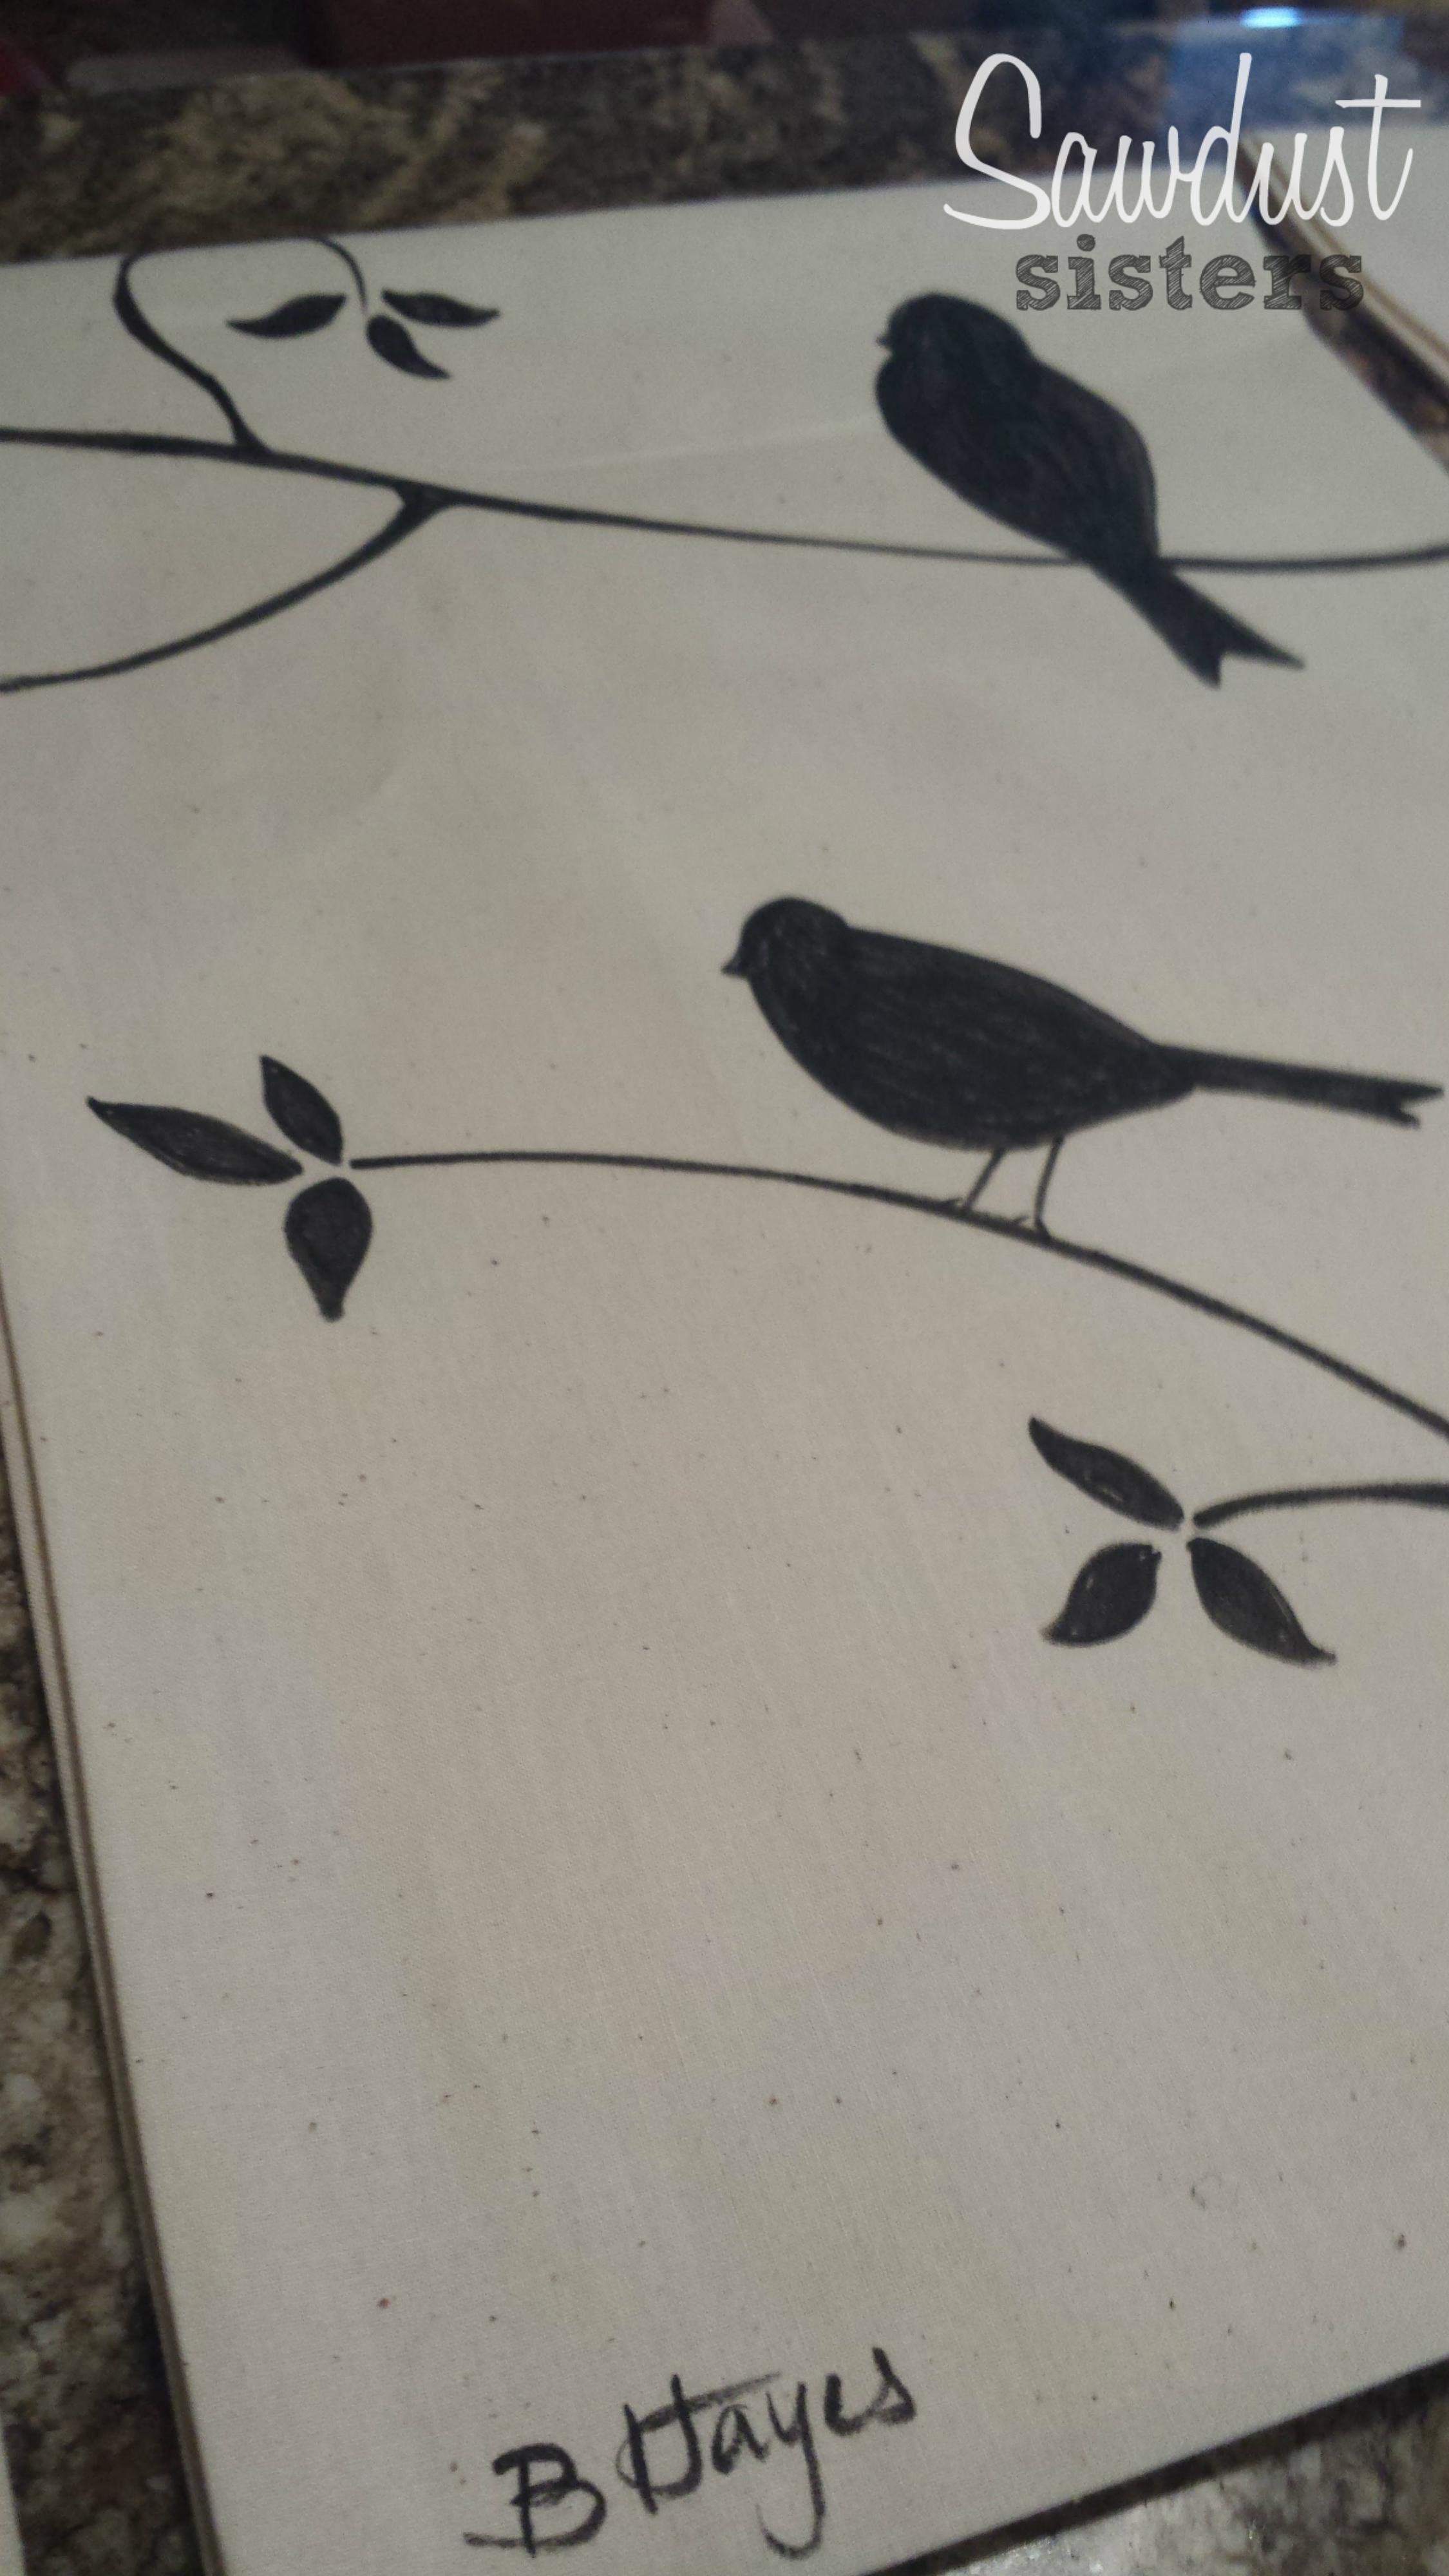 DIY Tea Towels/Kitchen Towels Sawdustsisters.com